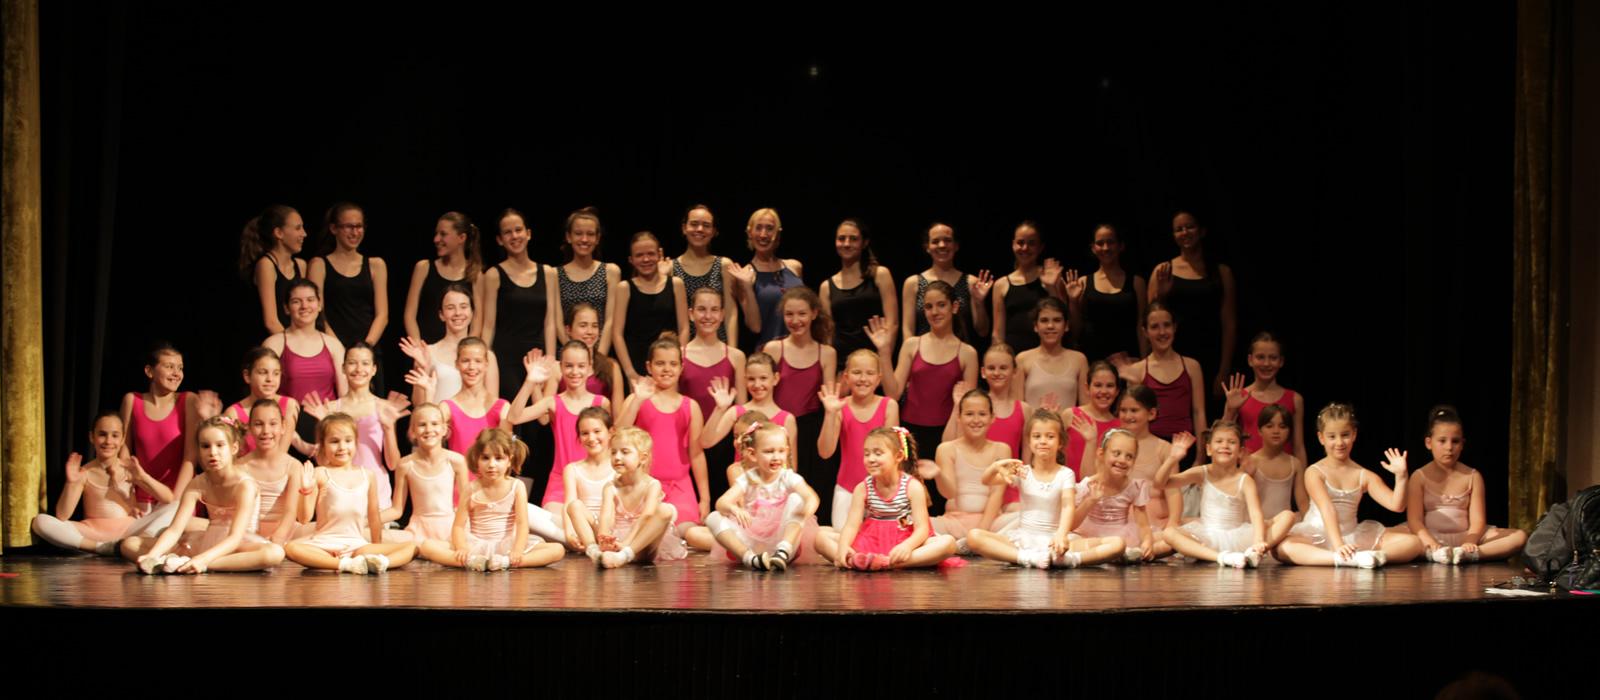 balet slika